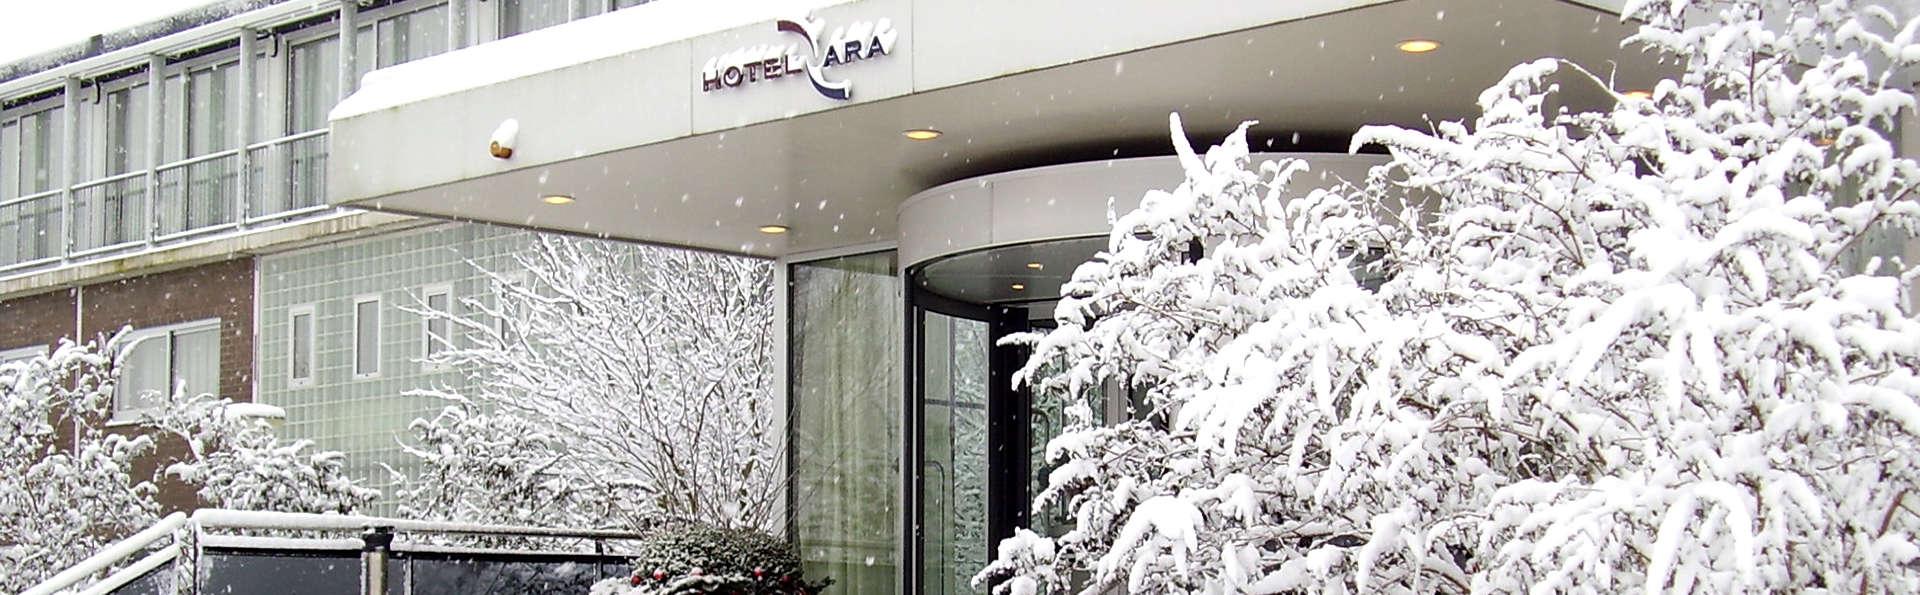 Van der Valk Hotel ARA  - EDIT_NEW2_FRONT.jpg